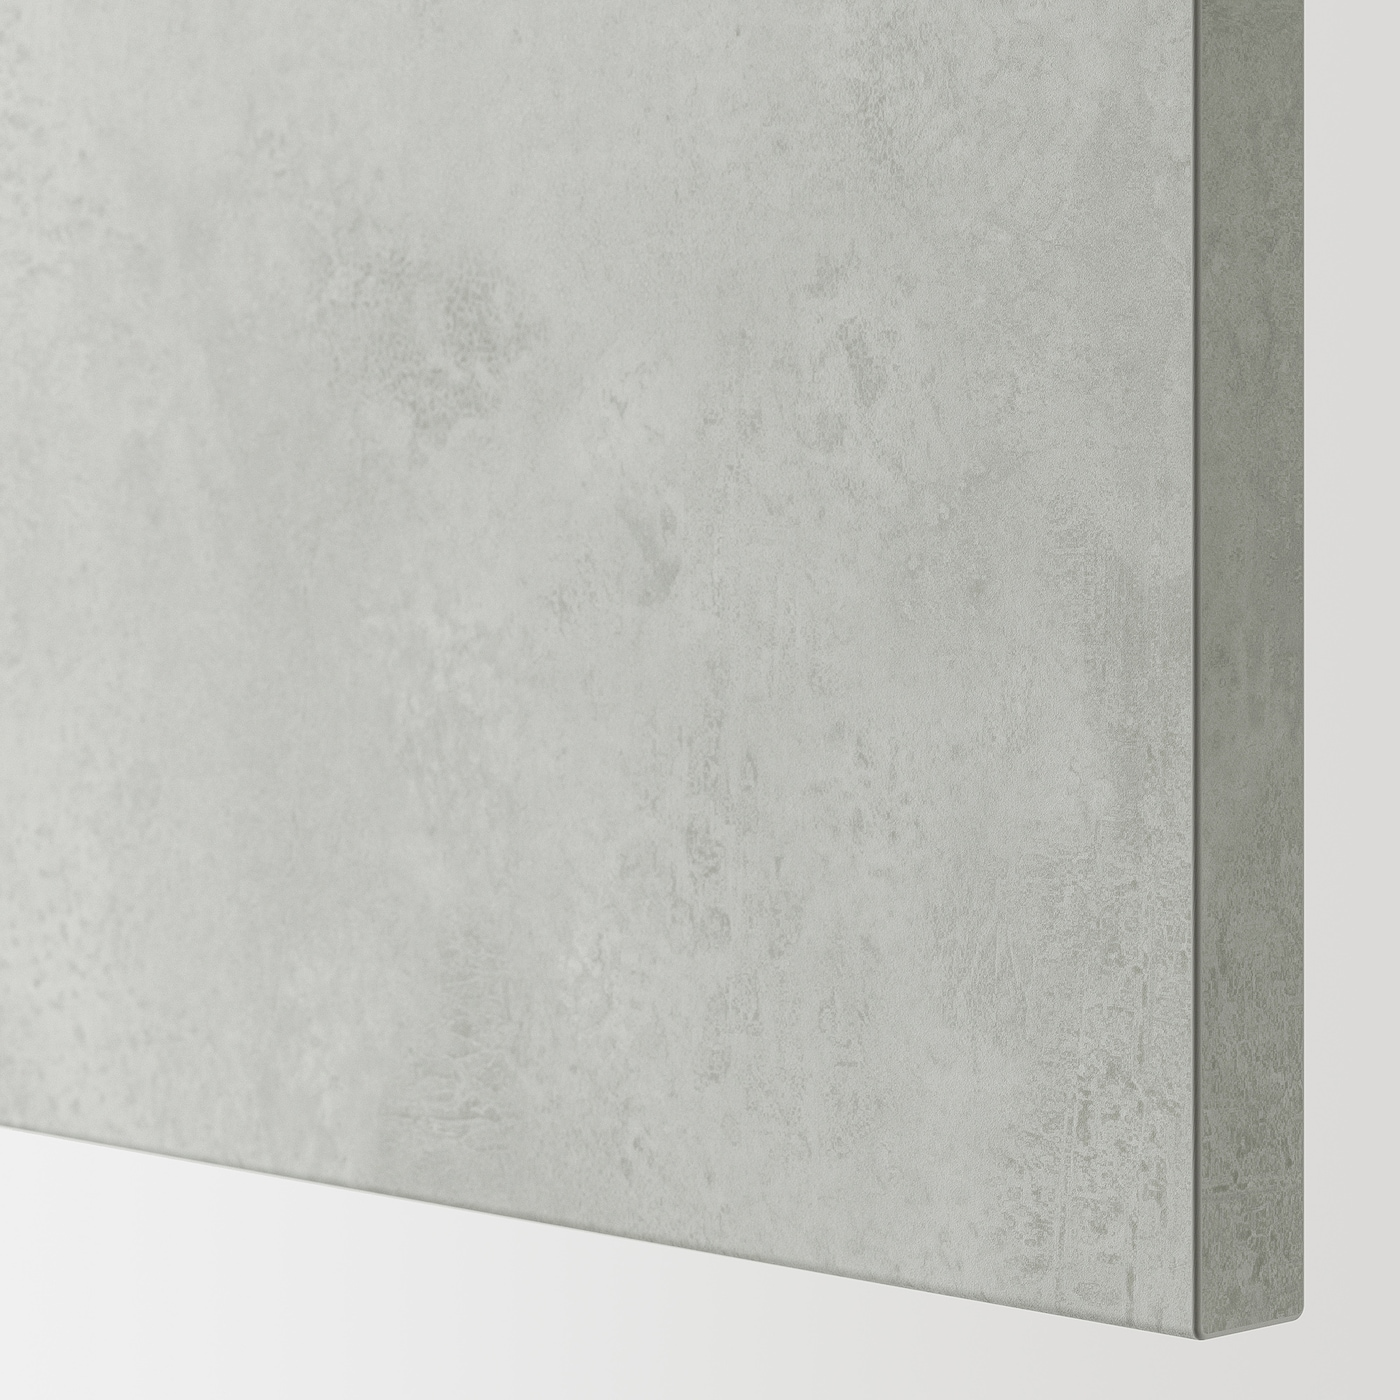 ENHET Ladefront, betonpatroon, 40x15 cm